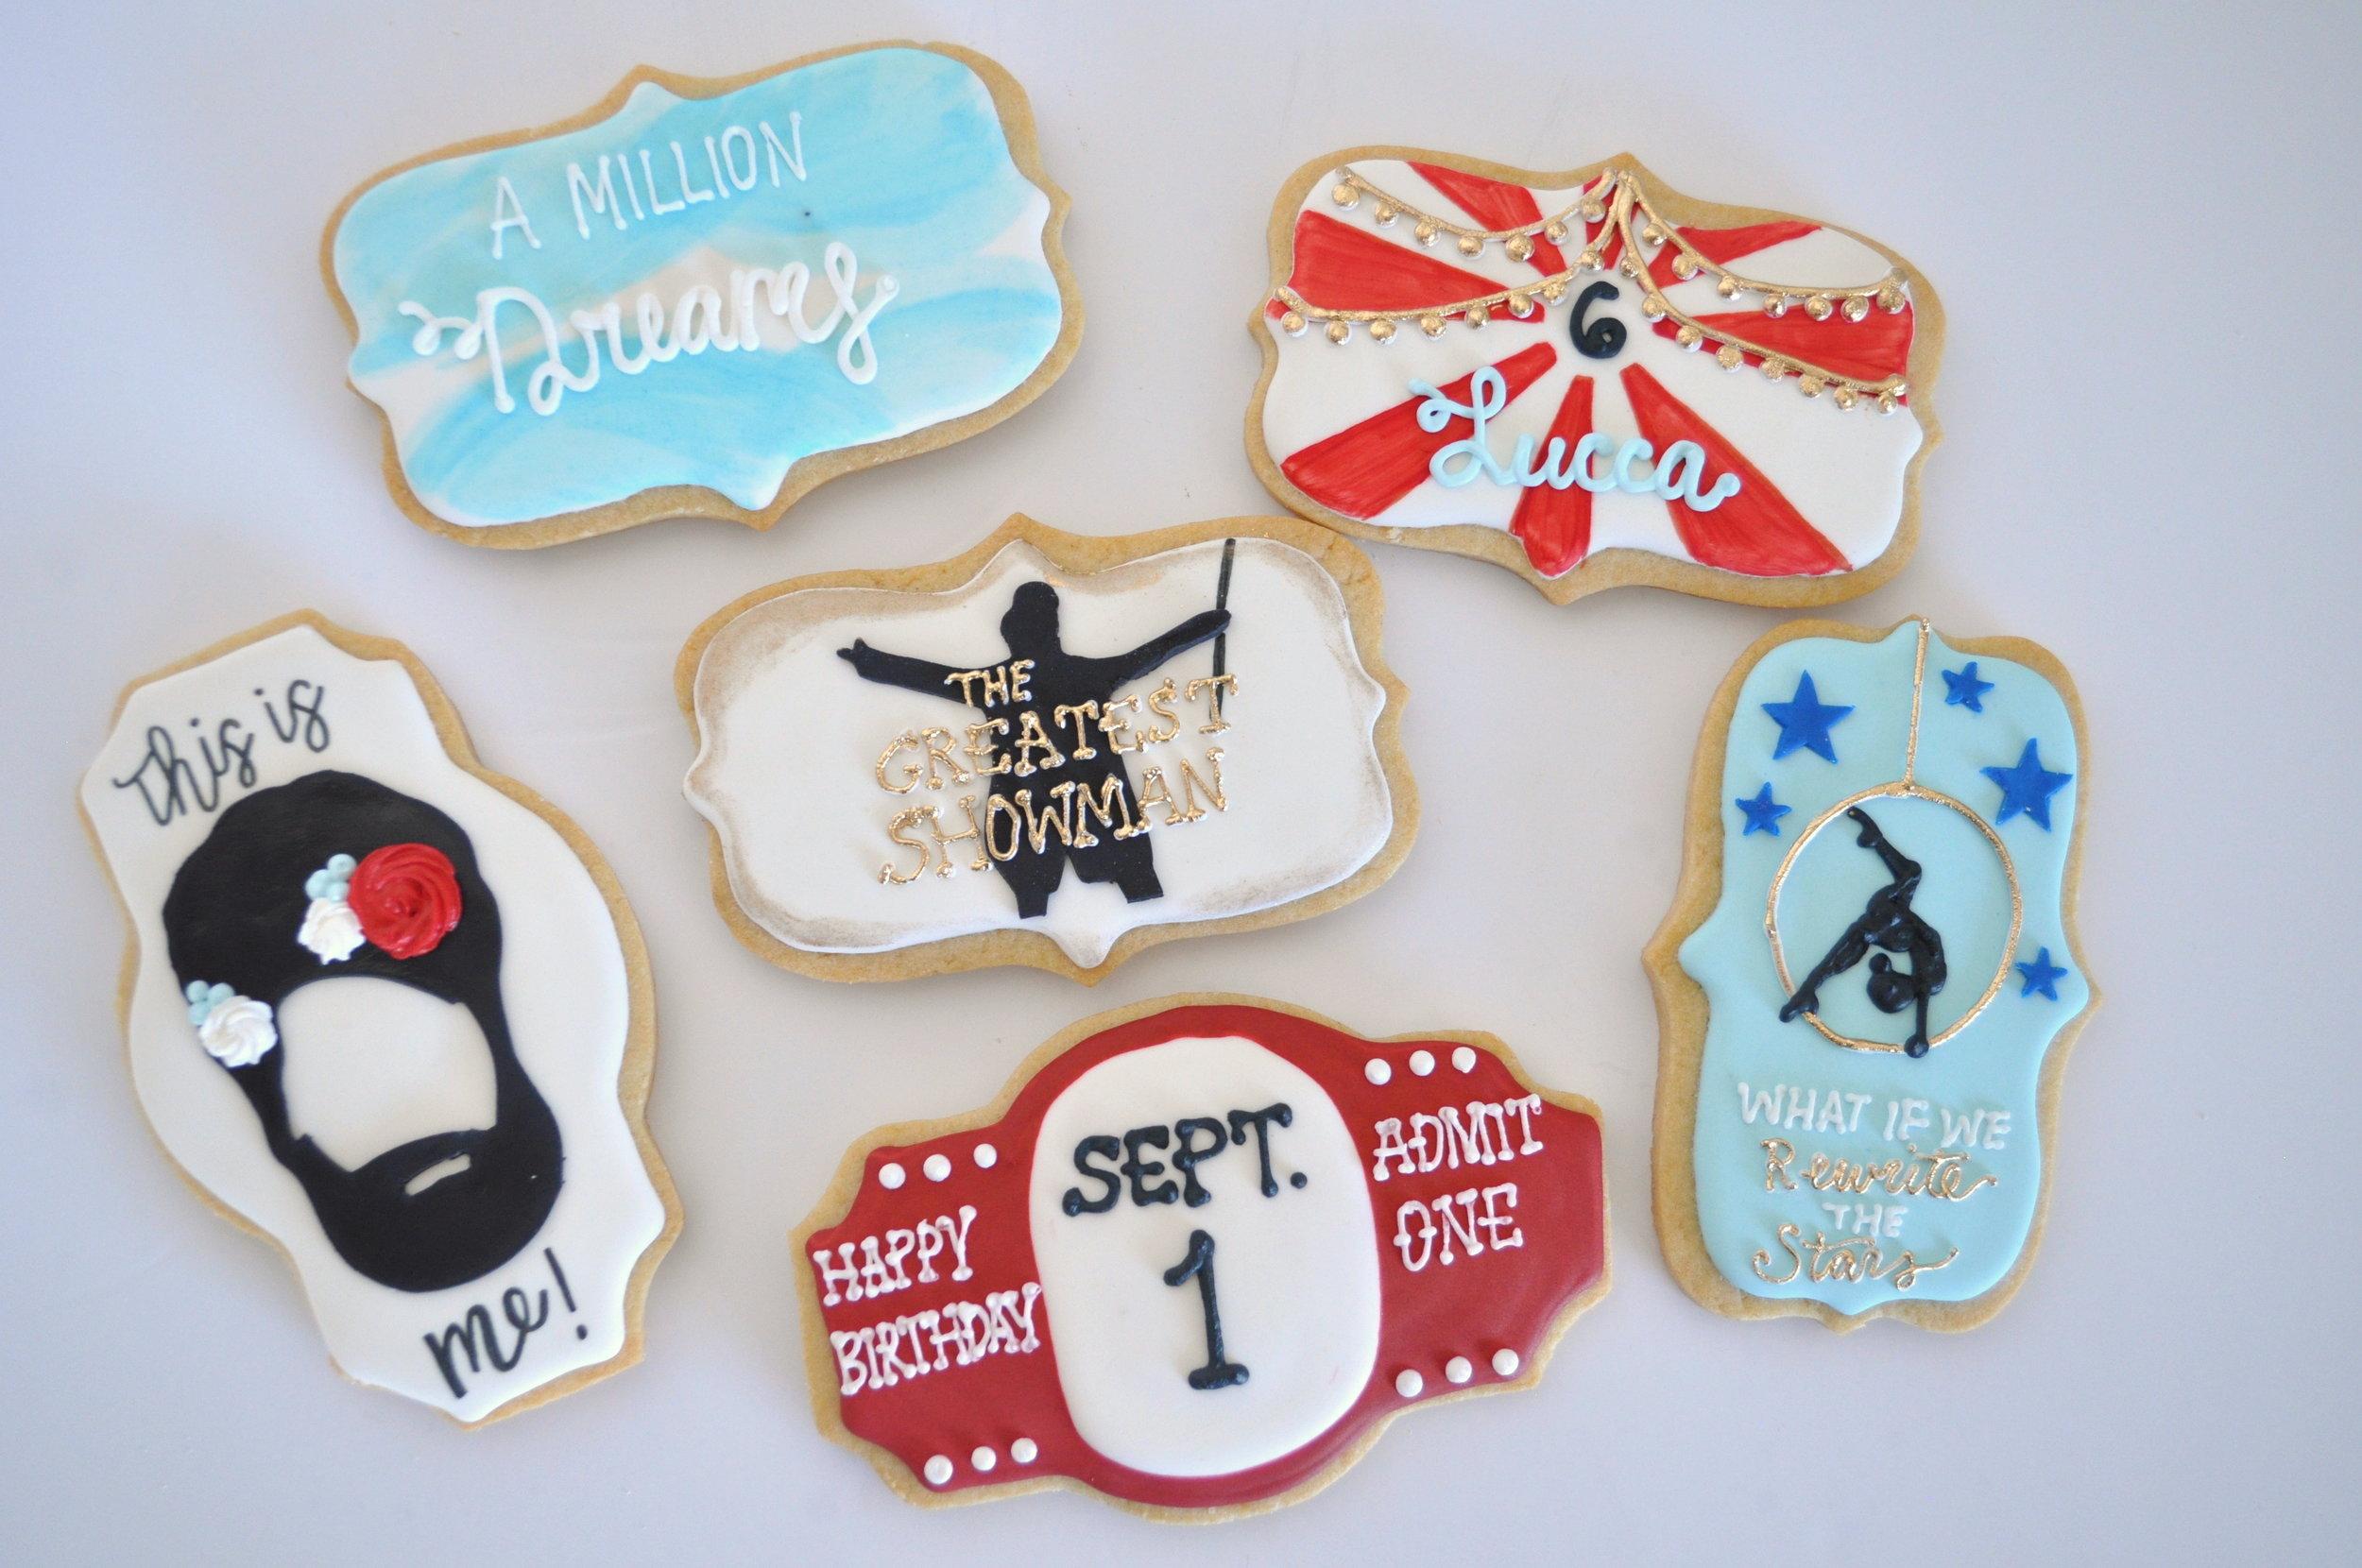 greatest showman sugar cookies.jpg